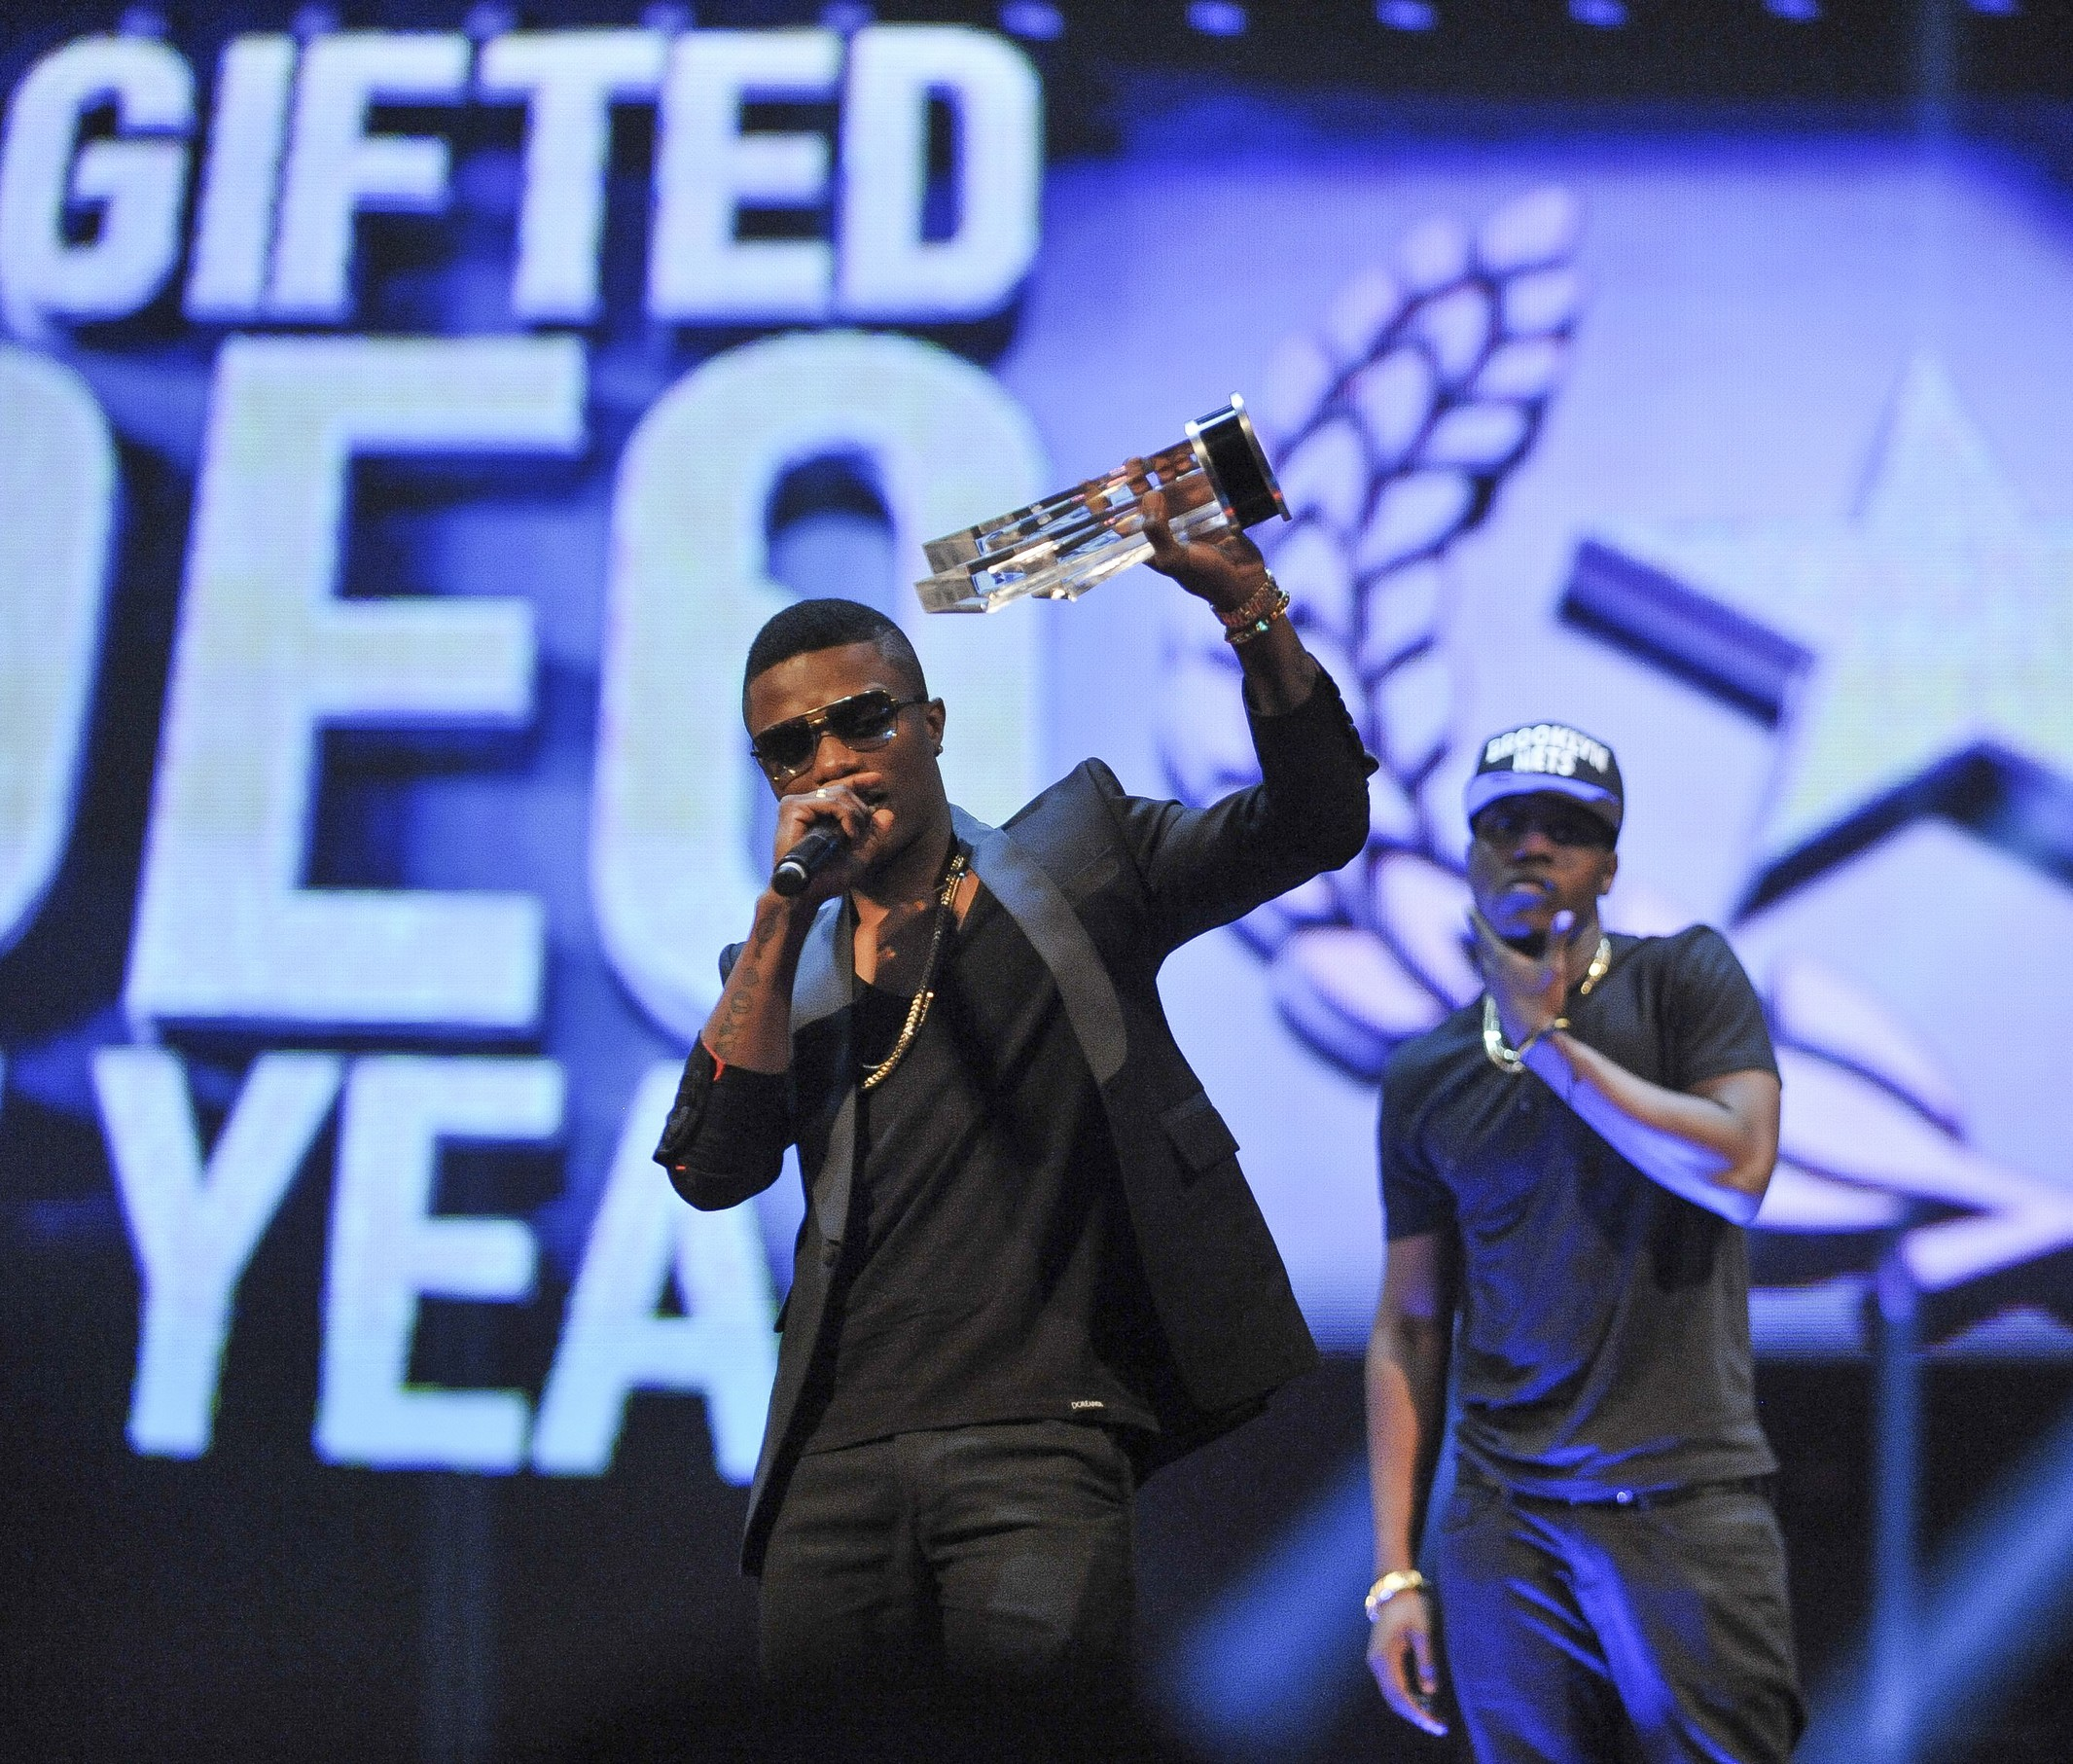 Get a memorable award